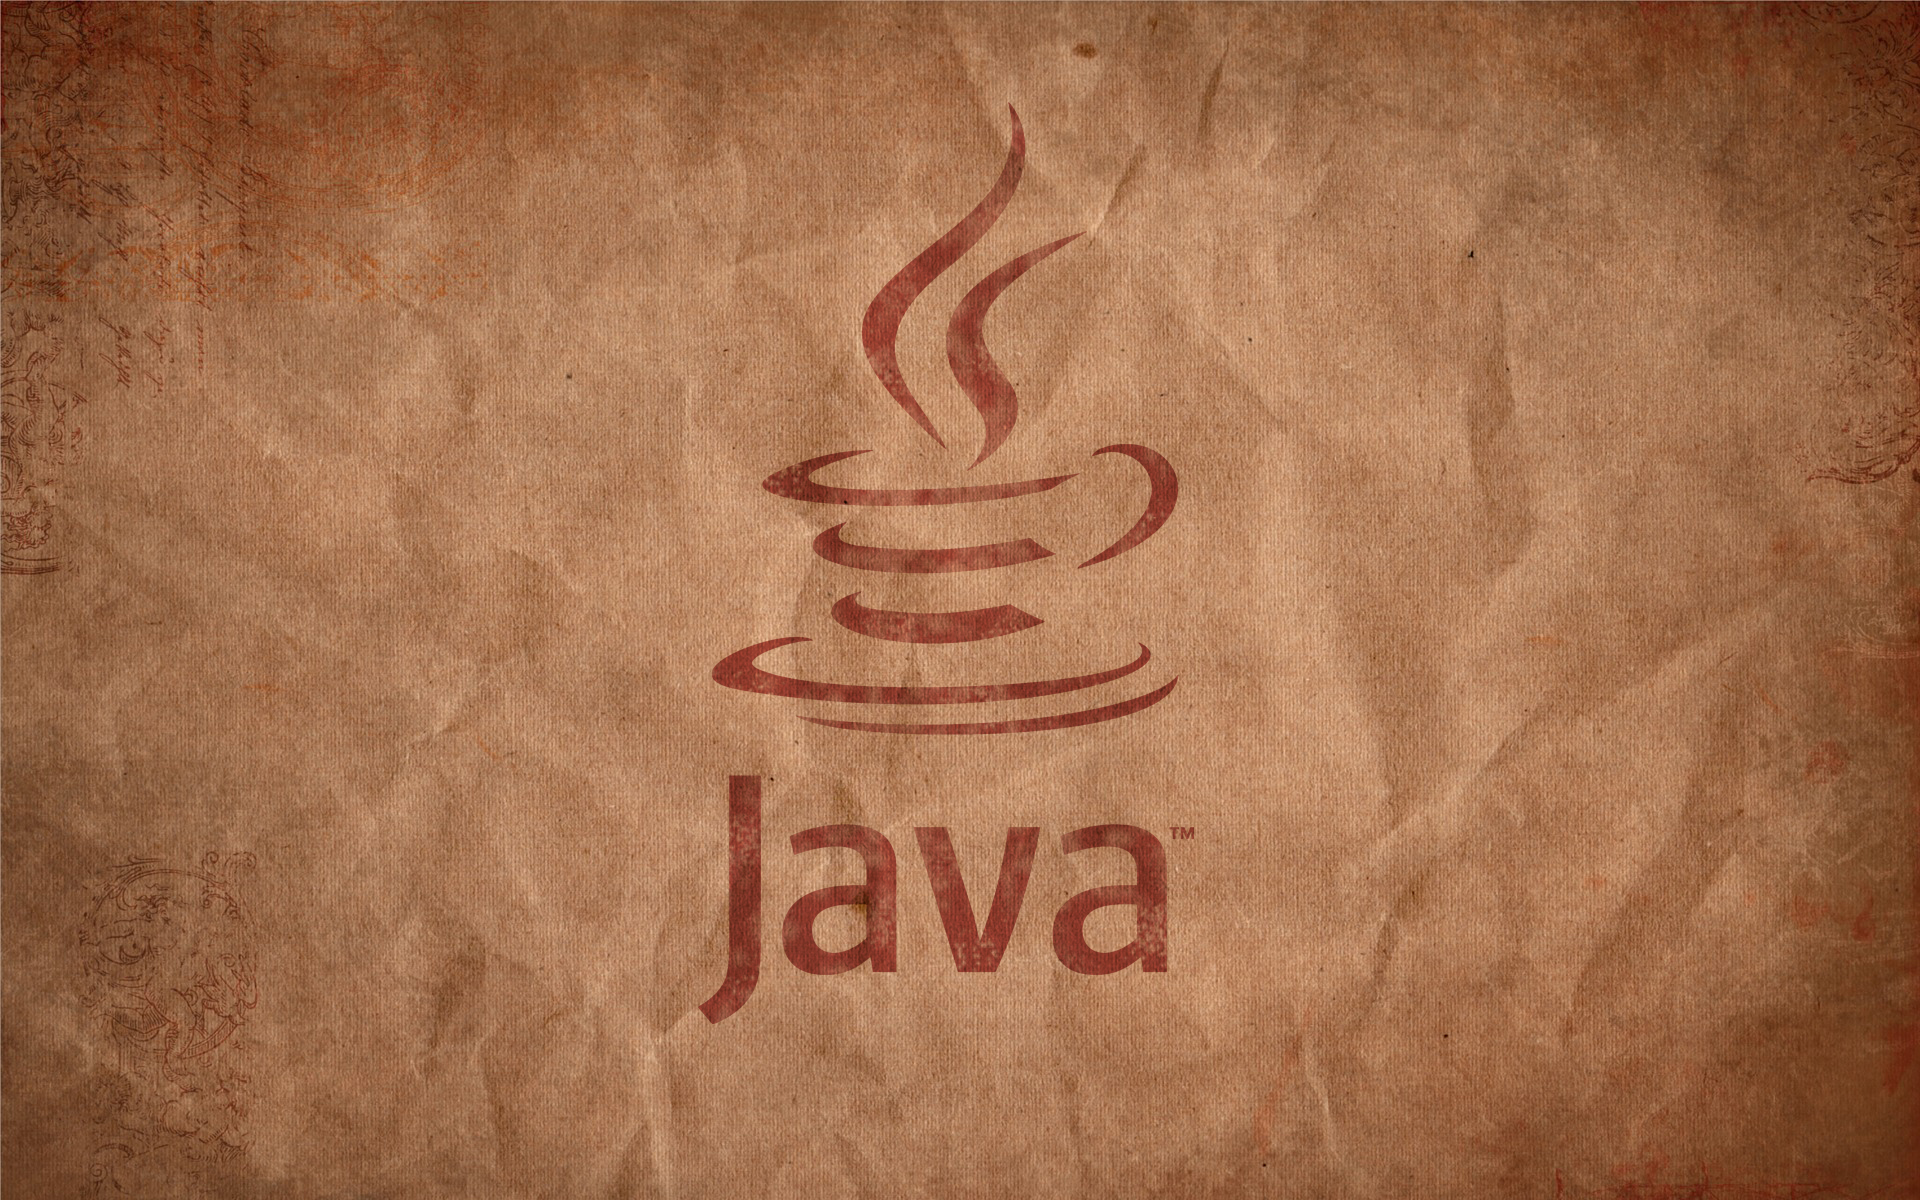 Oracle Java - Wise IT